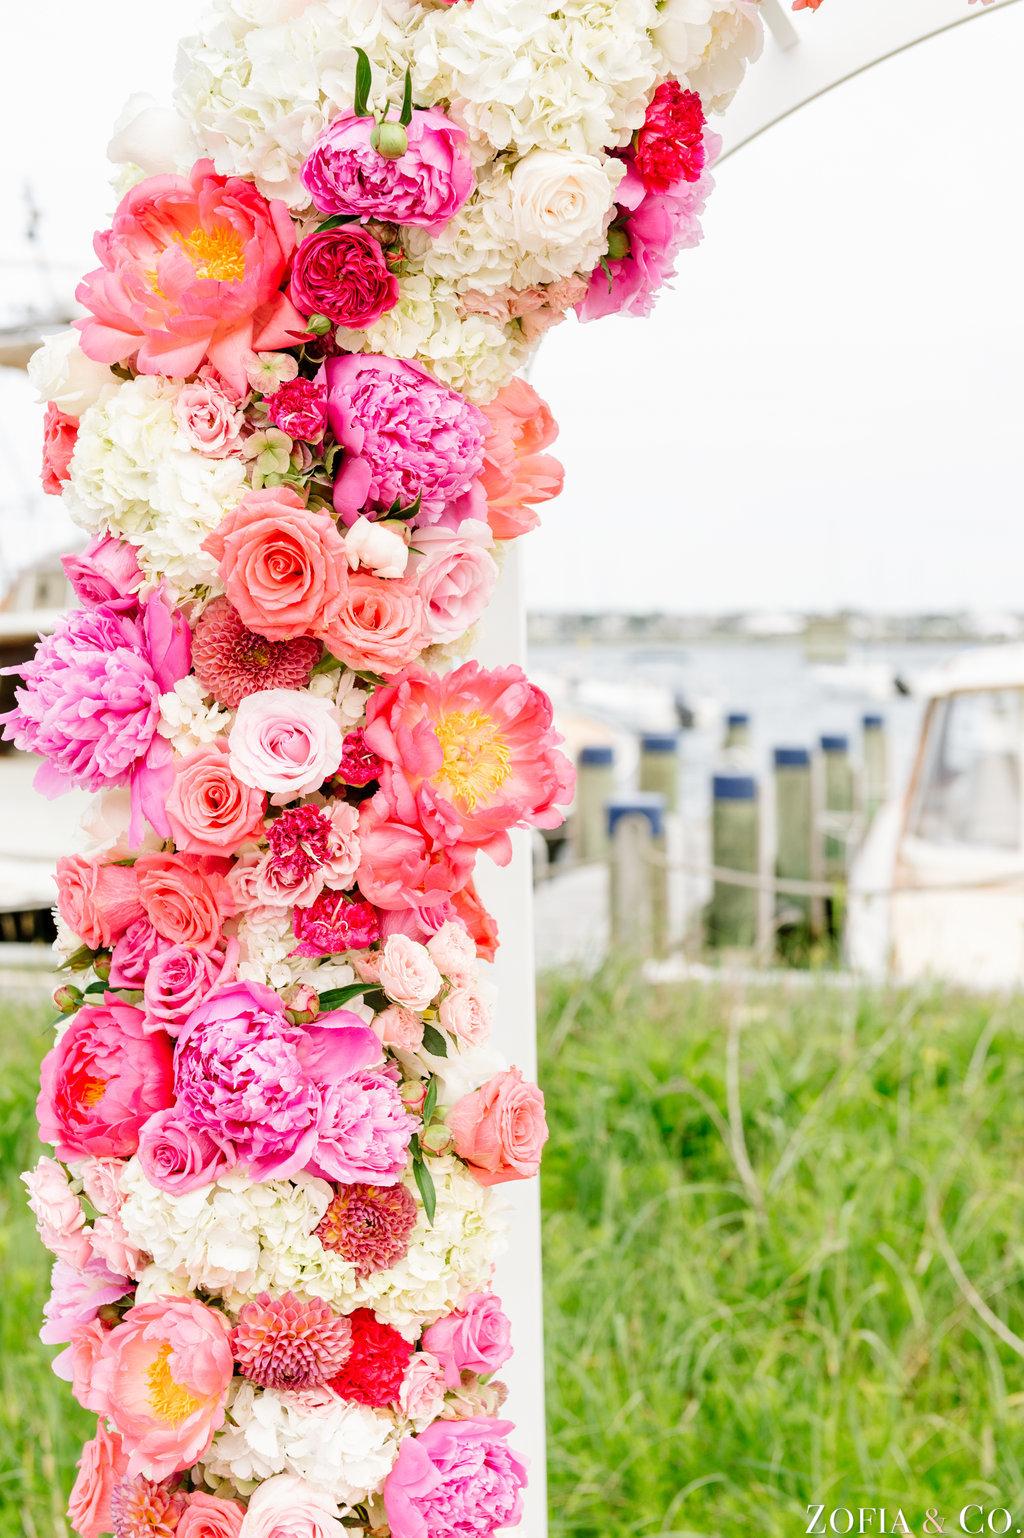 Ceci_New_York_Style_Luxury_Custom_Summer_Wedding_CeciBride_Nautical_Blue_Gold_Letterpress_Foil_202.jpg